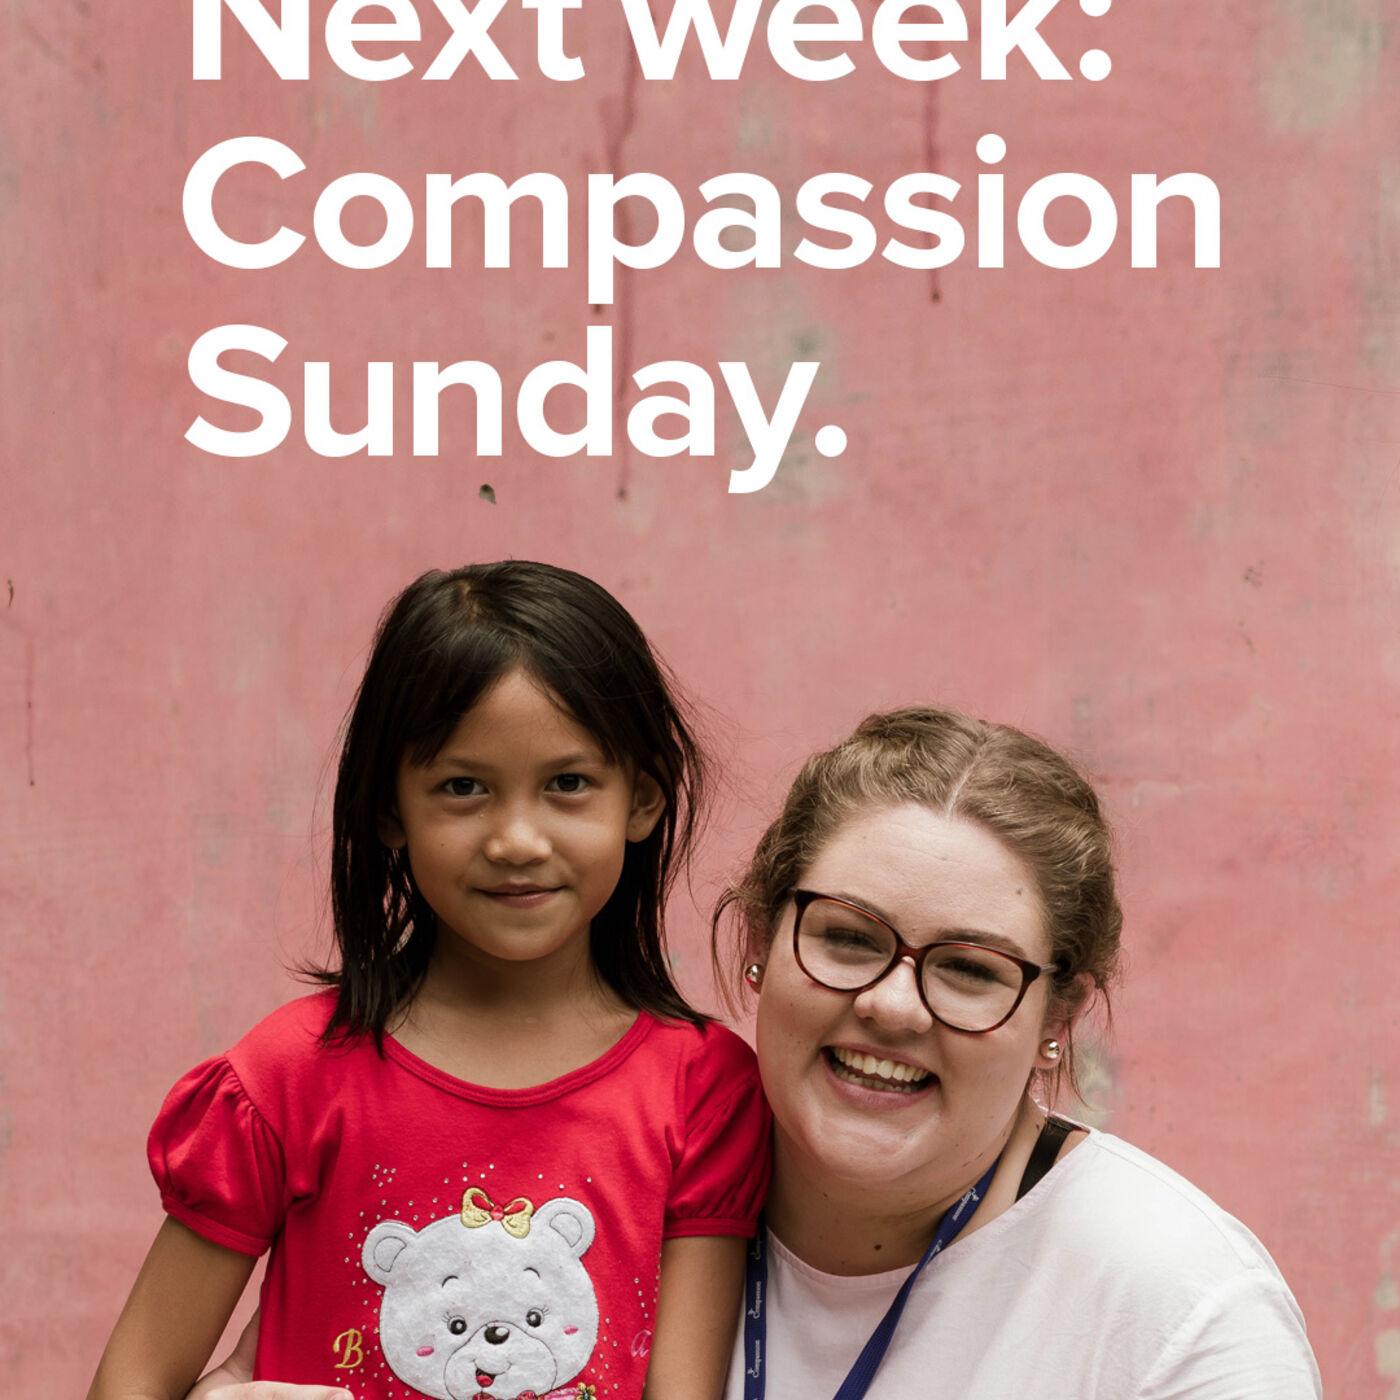 Compassion Sunday with Jordan St. Cyr